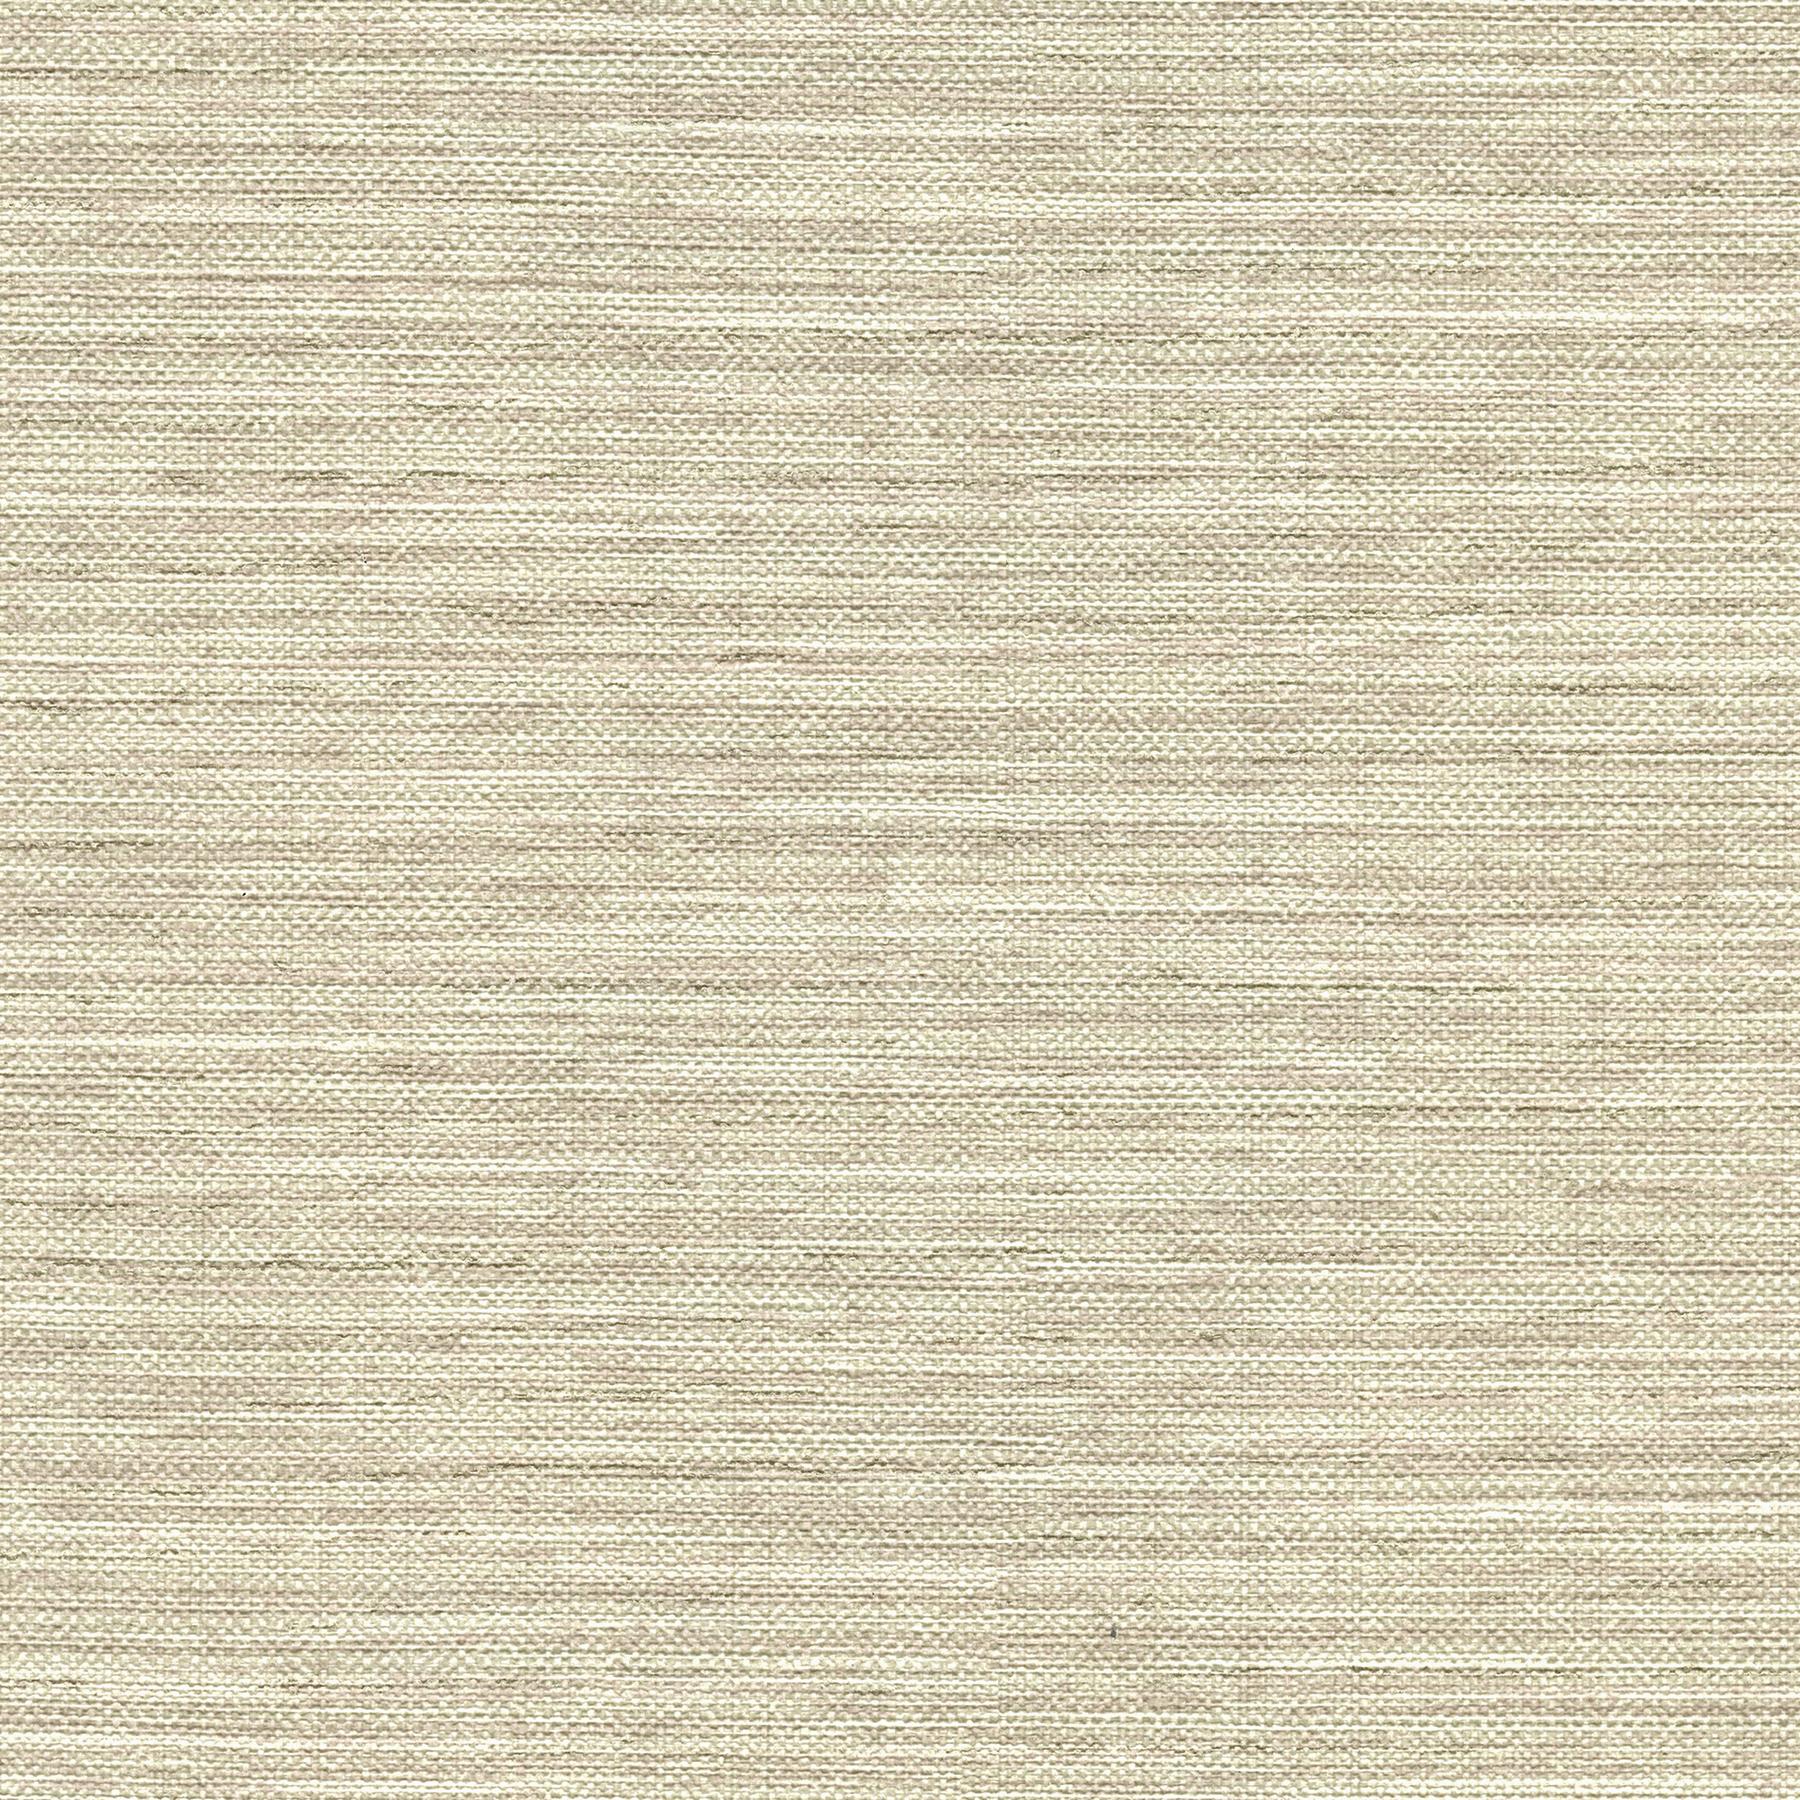 Picture of Bay Ridge Neutral Linen Texture Wallpaper